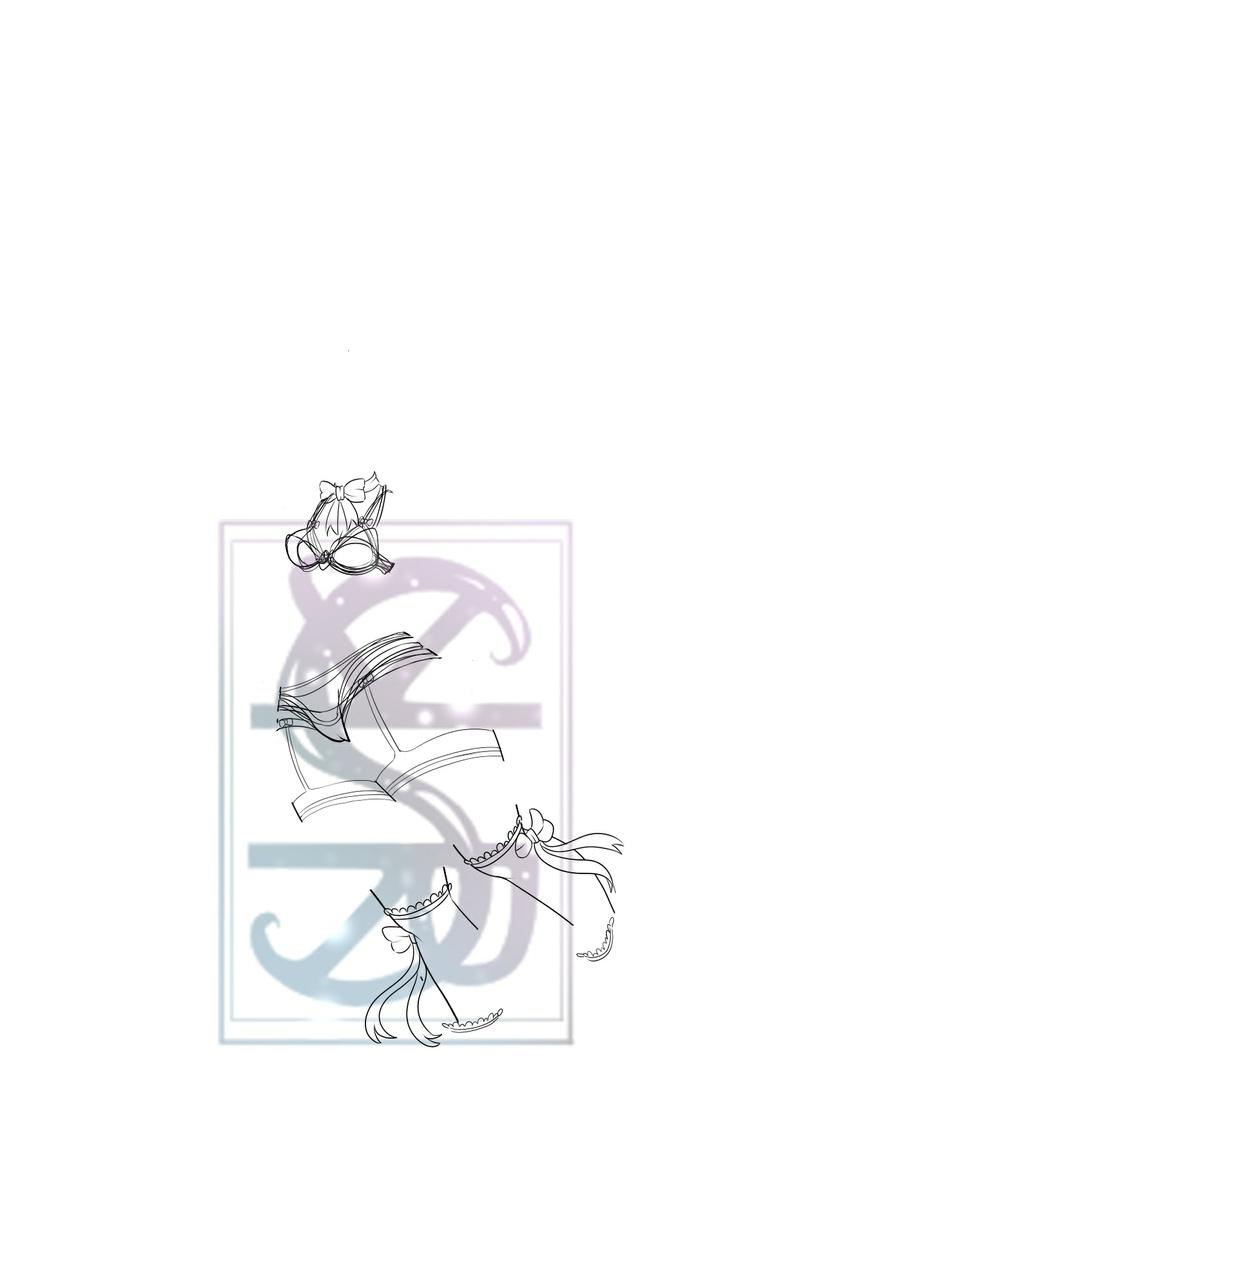 [P2U] Underwear Pack 01 for Chibi Furry Base 01